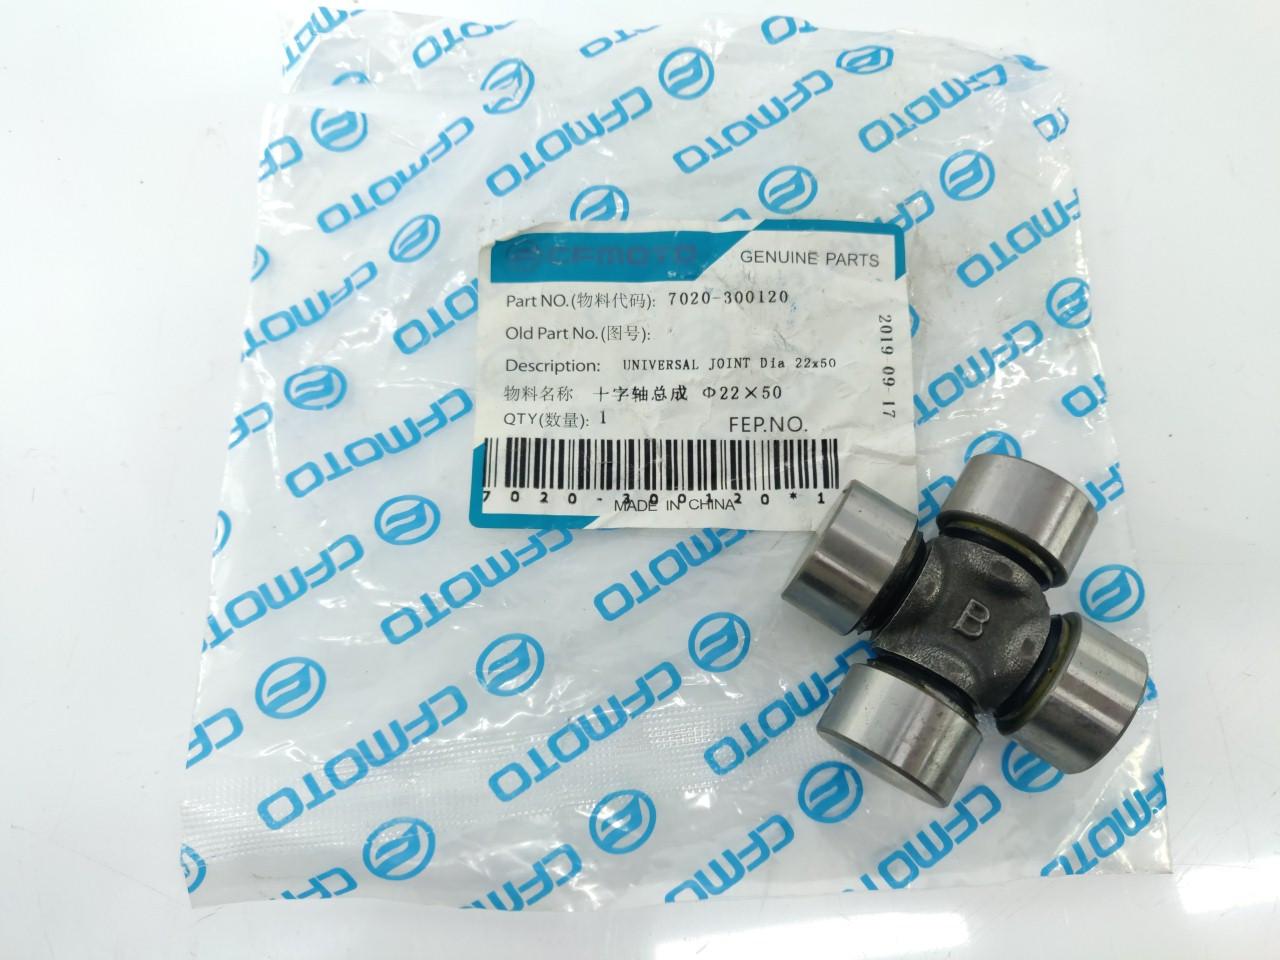 Крестовина для квадроцикла CF MOTO 800 X8  CF550 X5 CF400 CF450 CF 500-2a  (22x50)